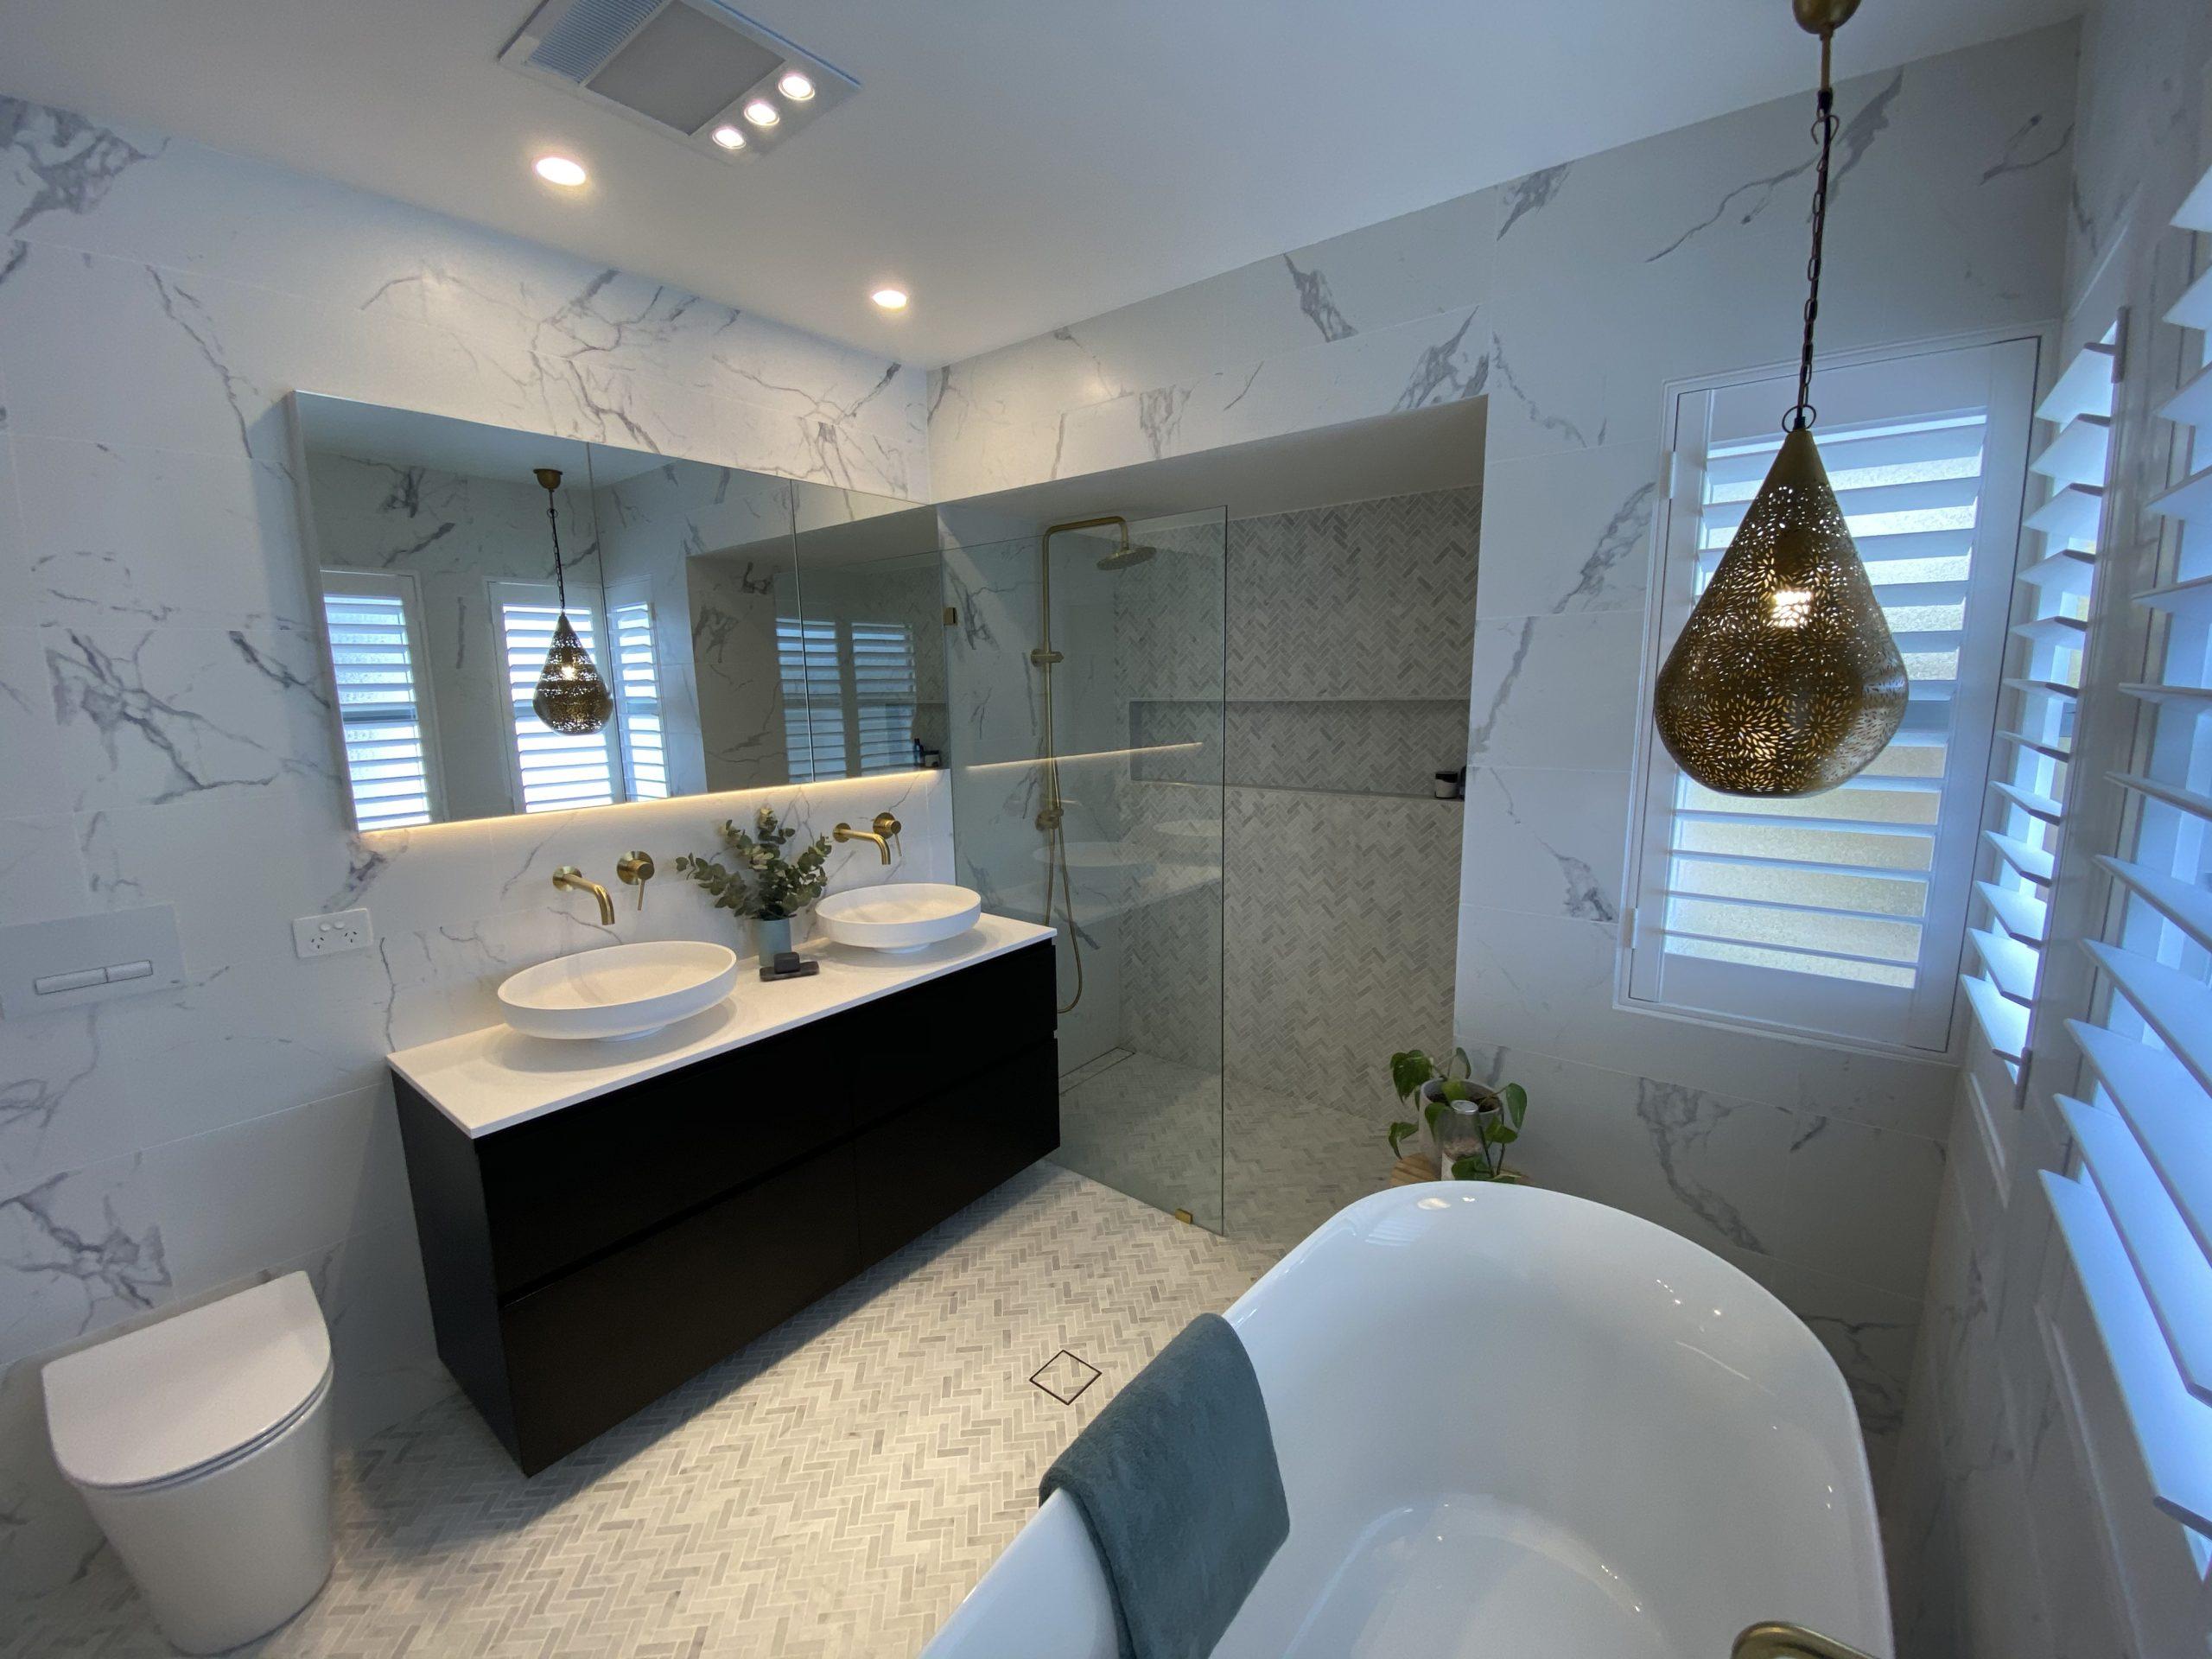 Caringbah South Sutherland Shire Modern Bathroom Renovations